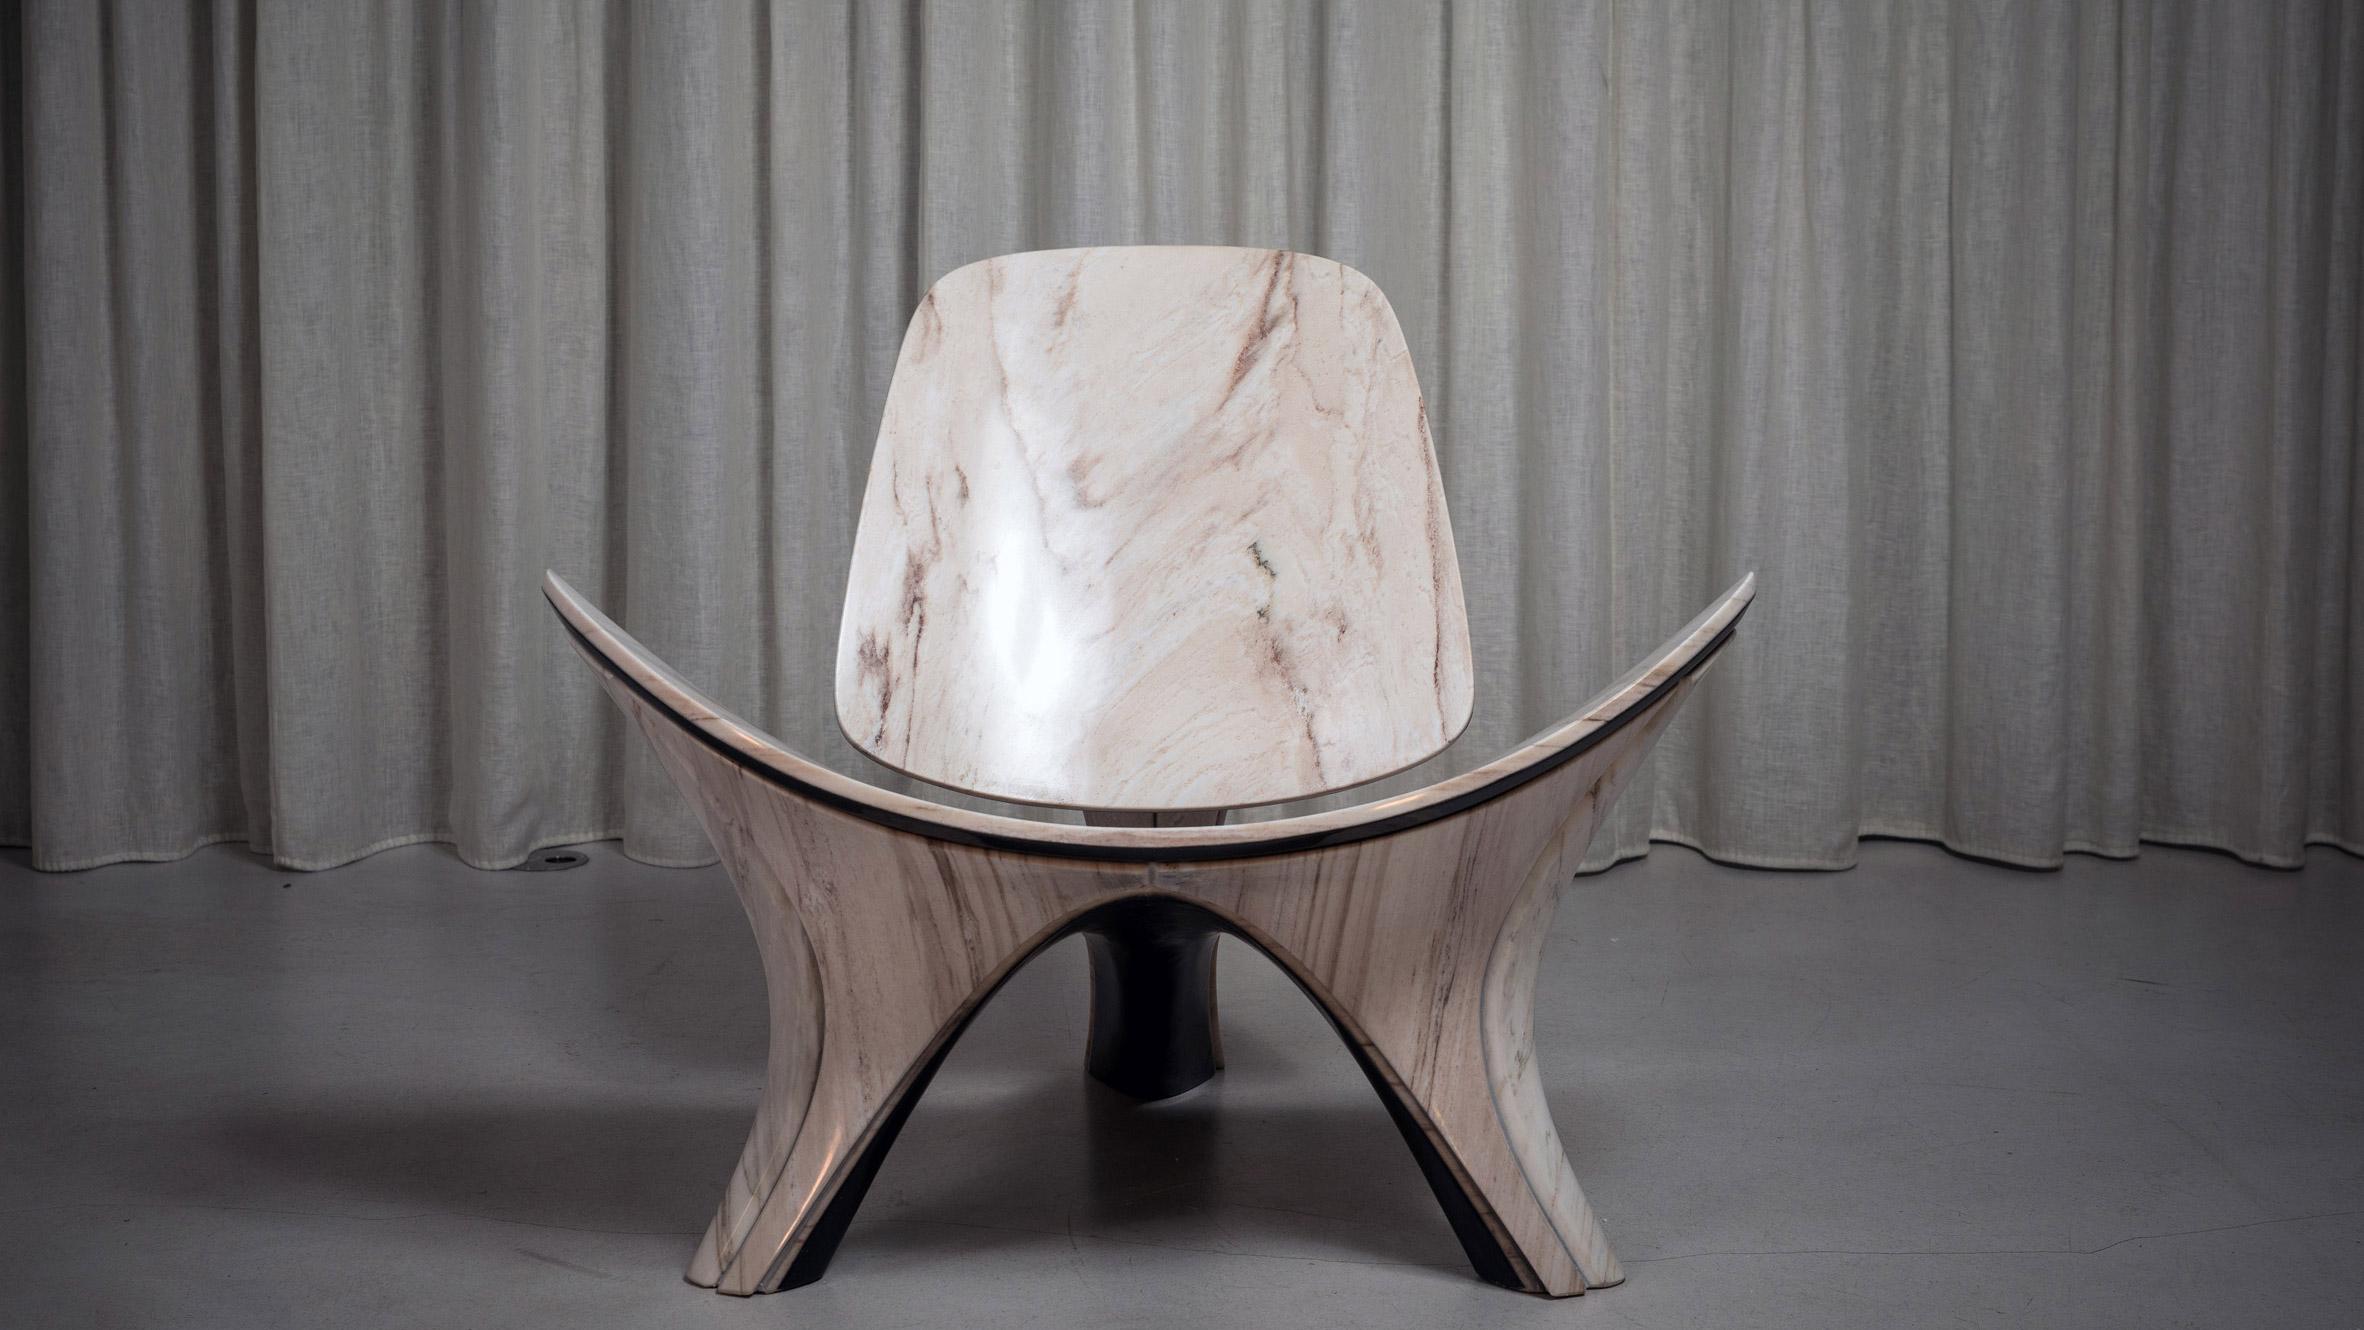 Lapella chair by Zaha Hadid Architects